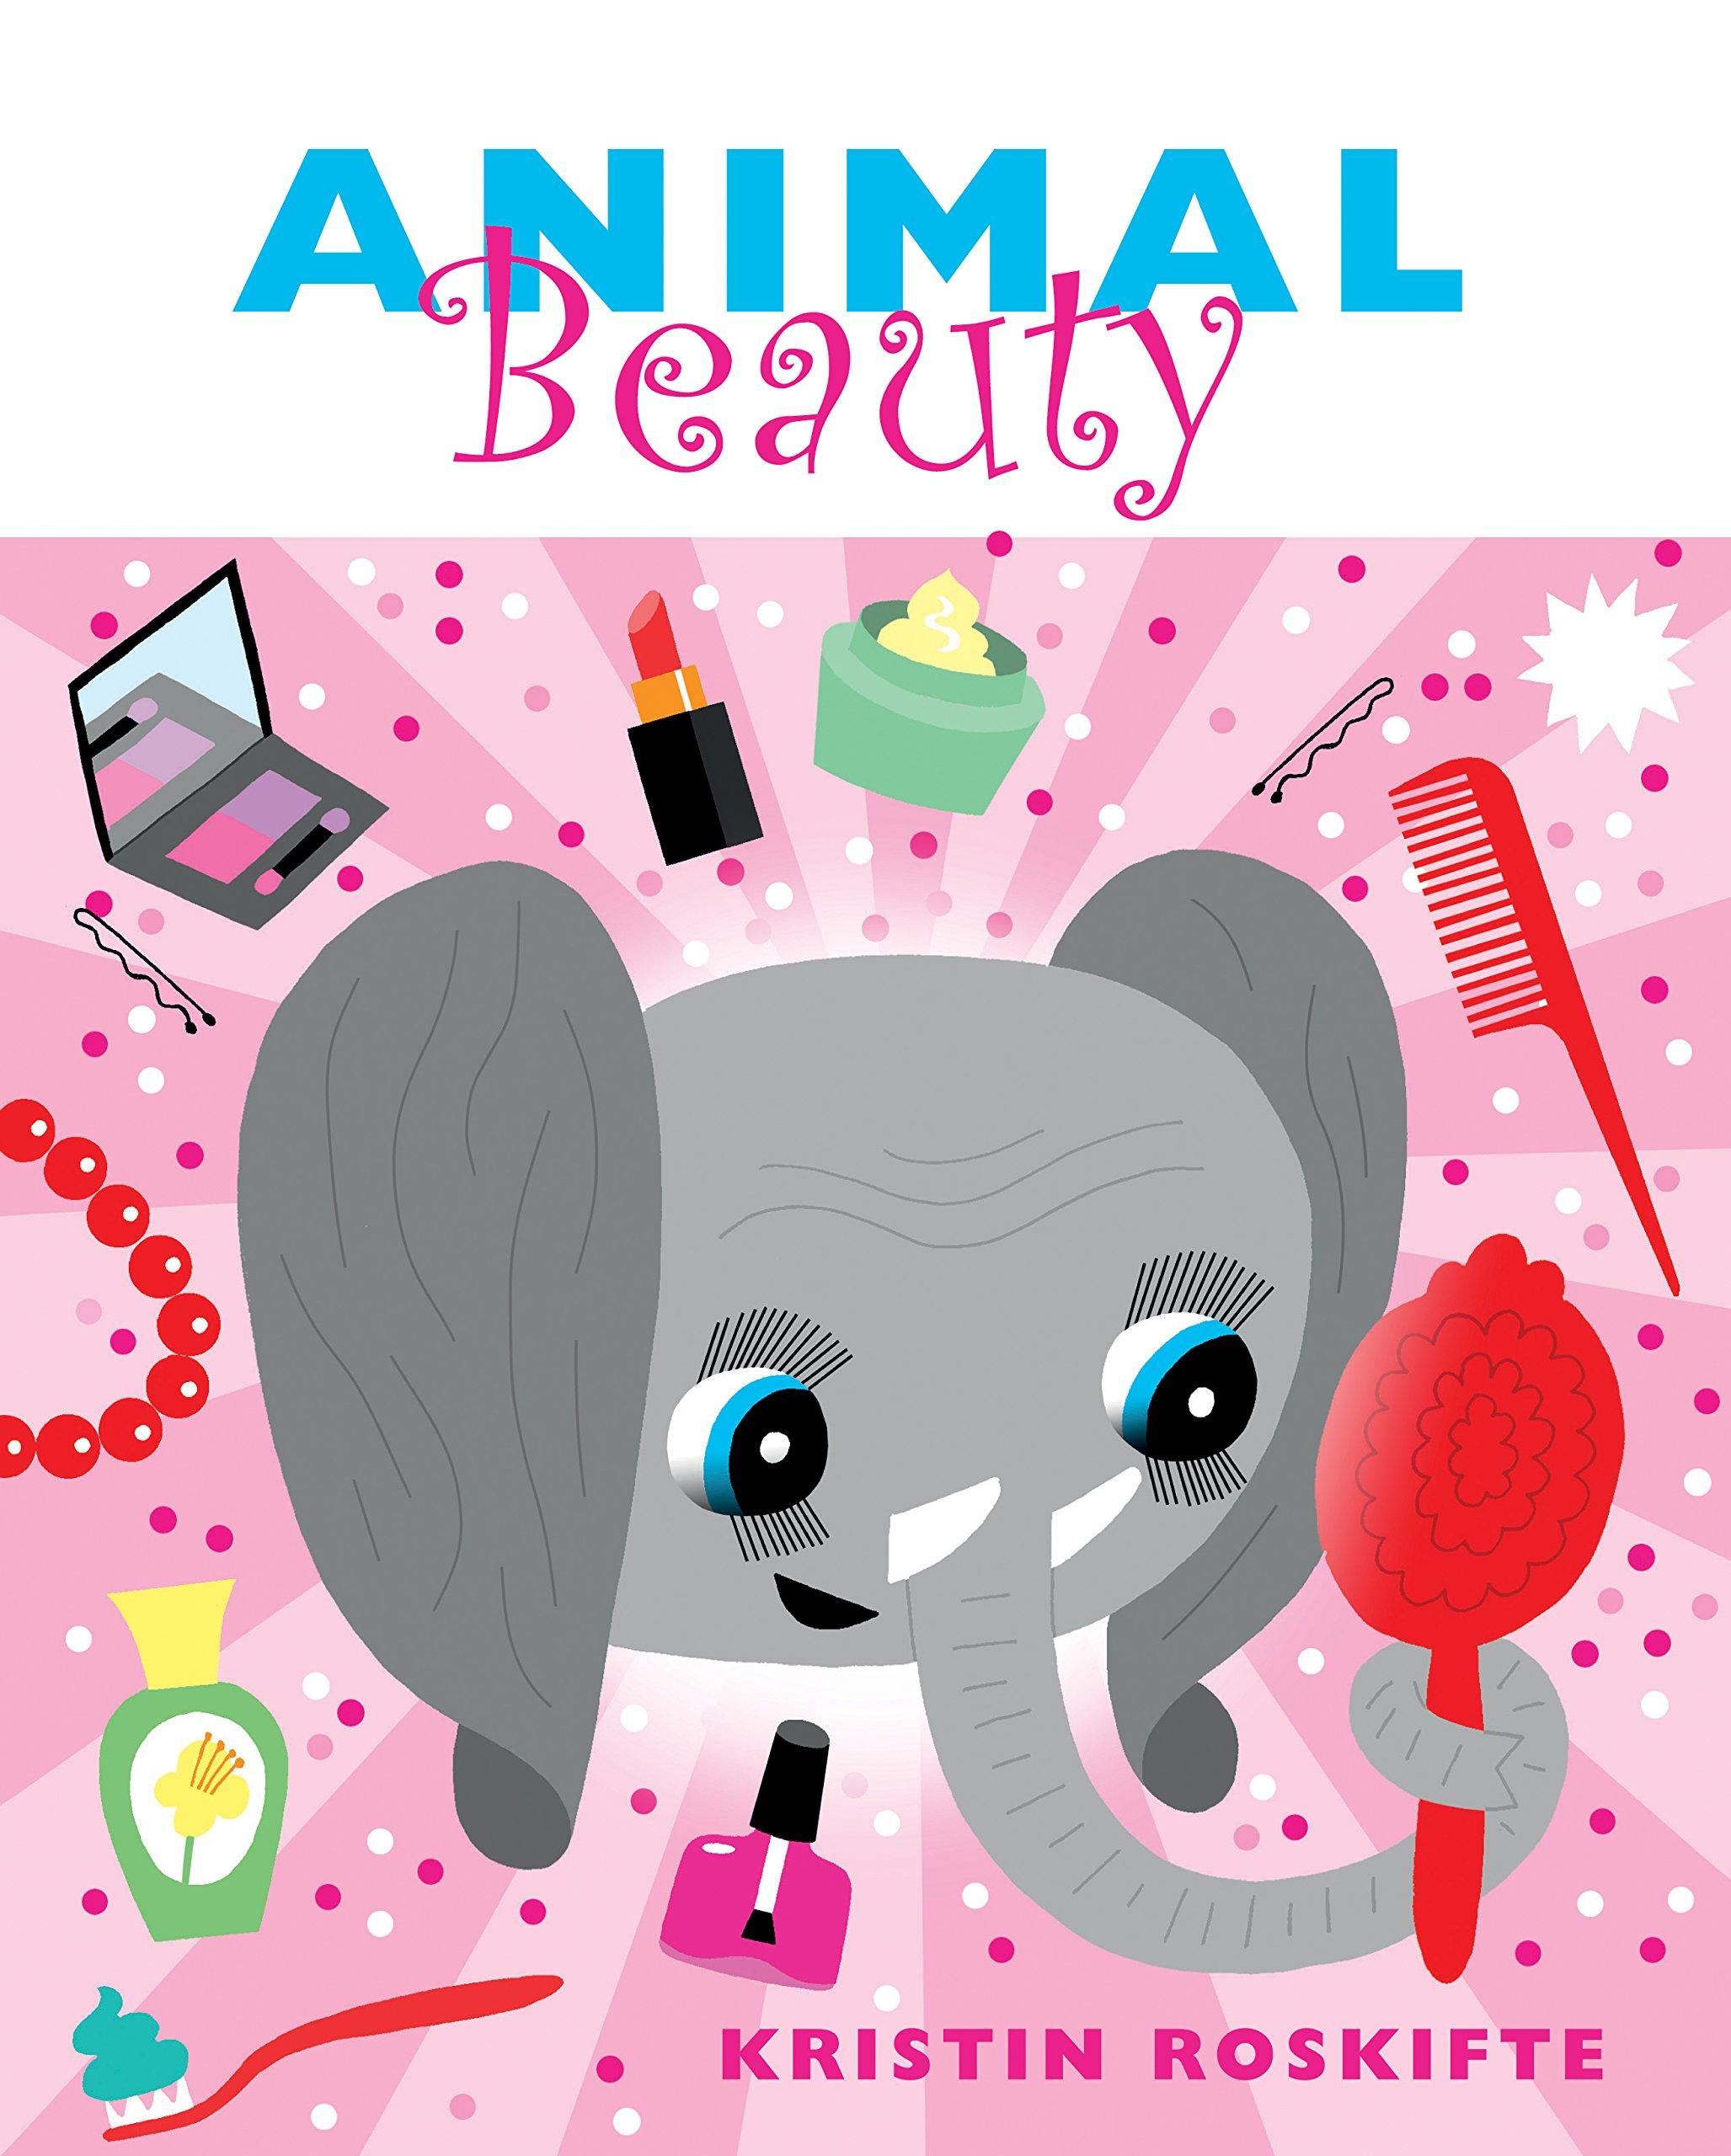 Animal Beauty: Kristin Roskifte: 9780802854544: Amazon.com: Books